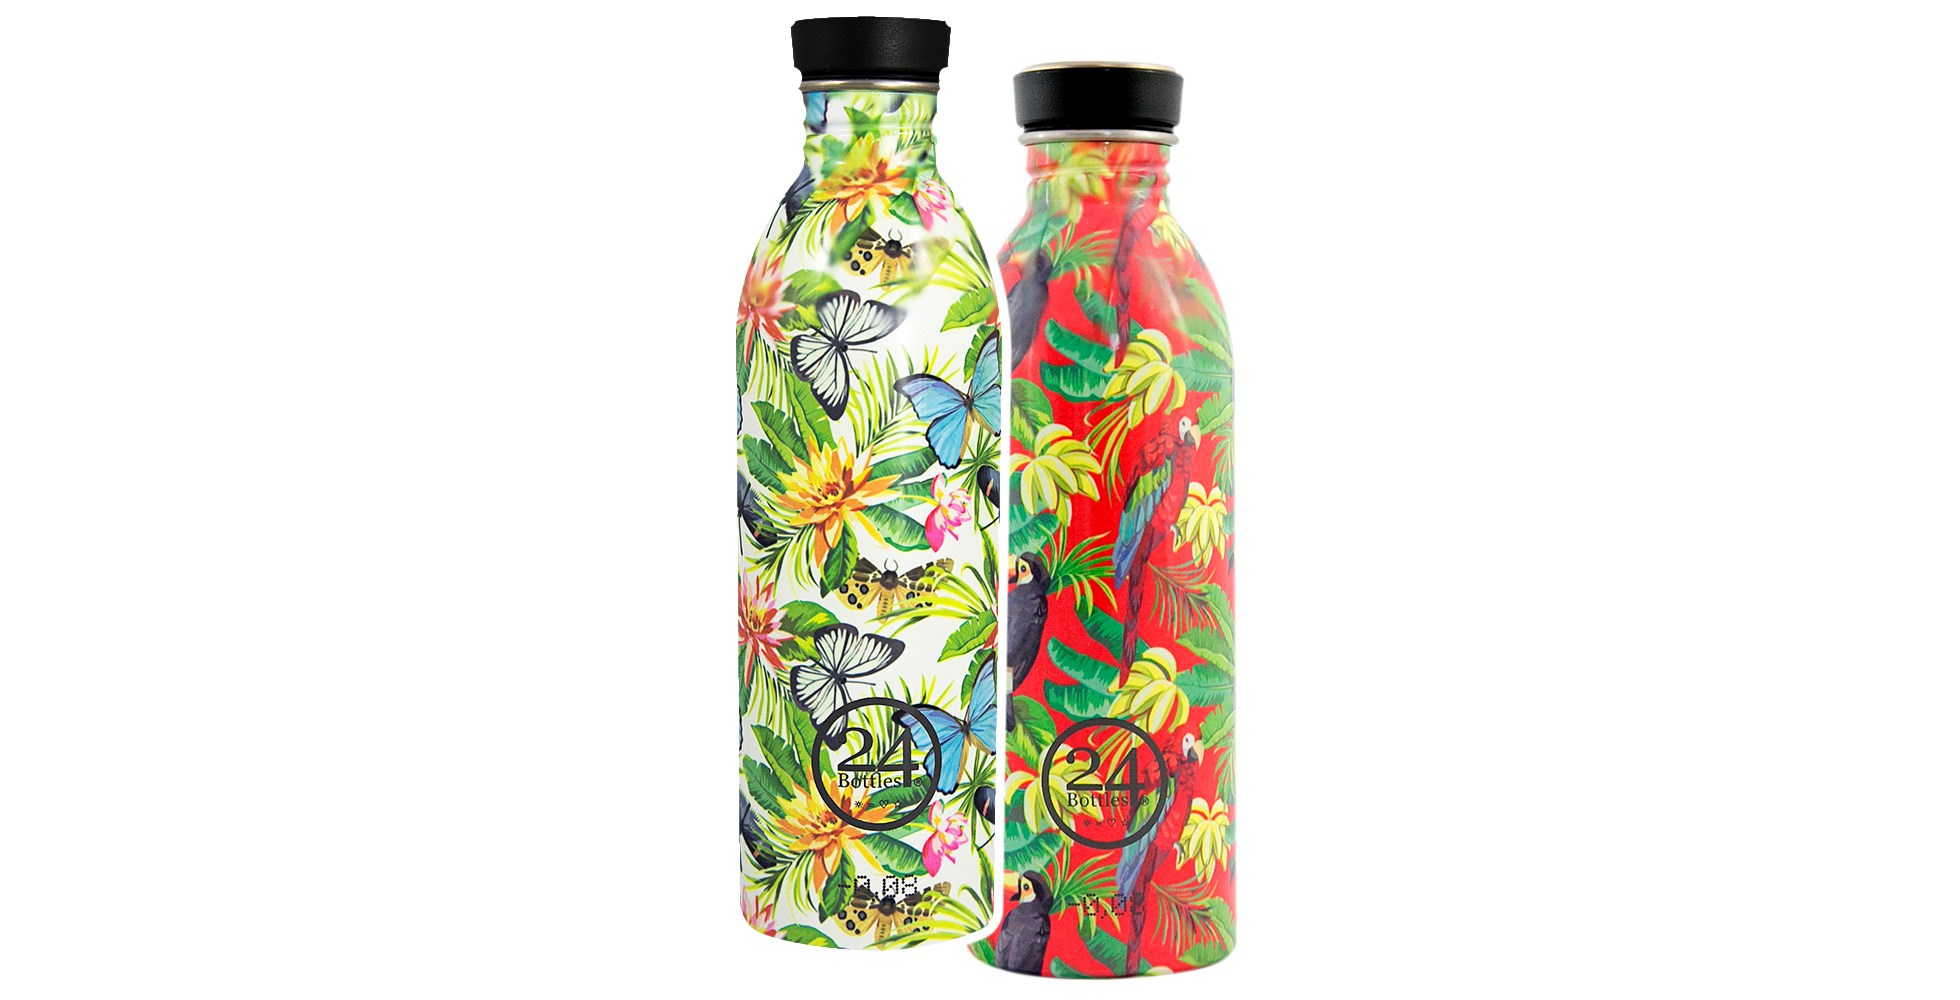 Carioca Urban Bottle